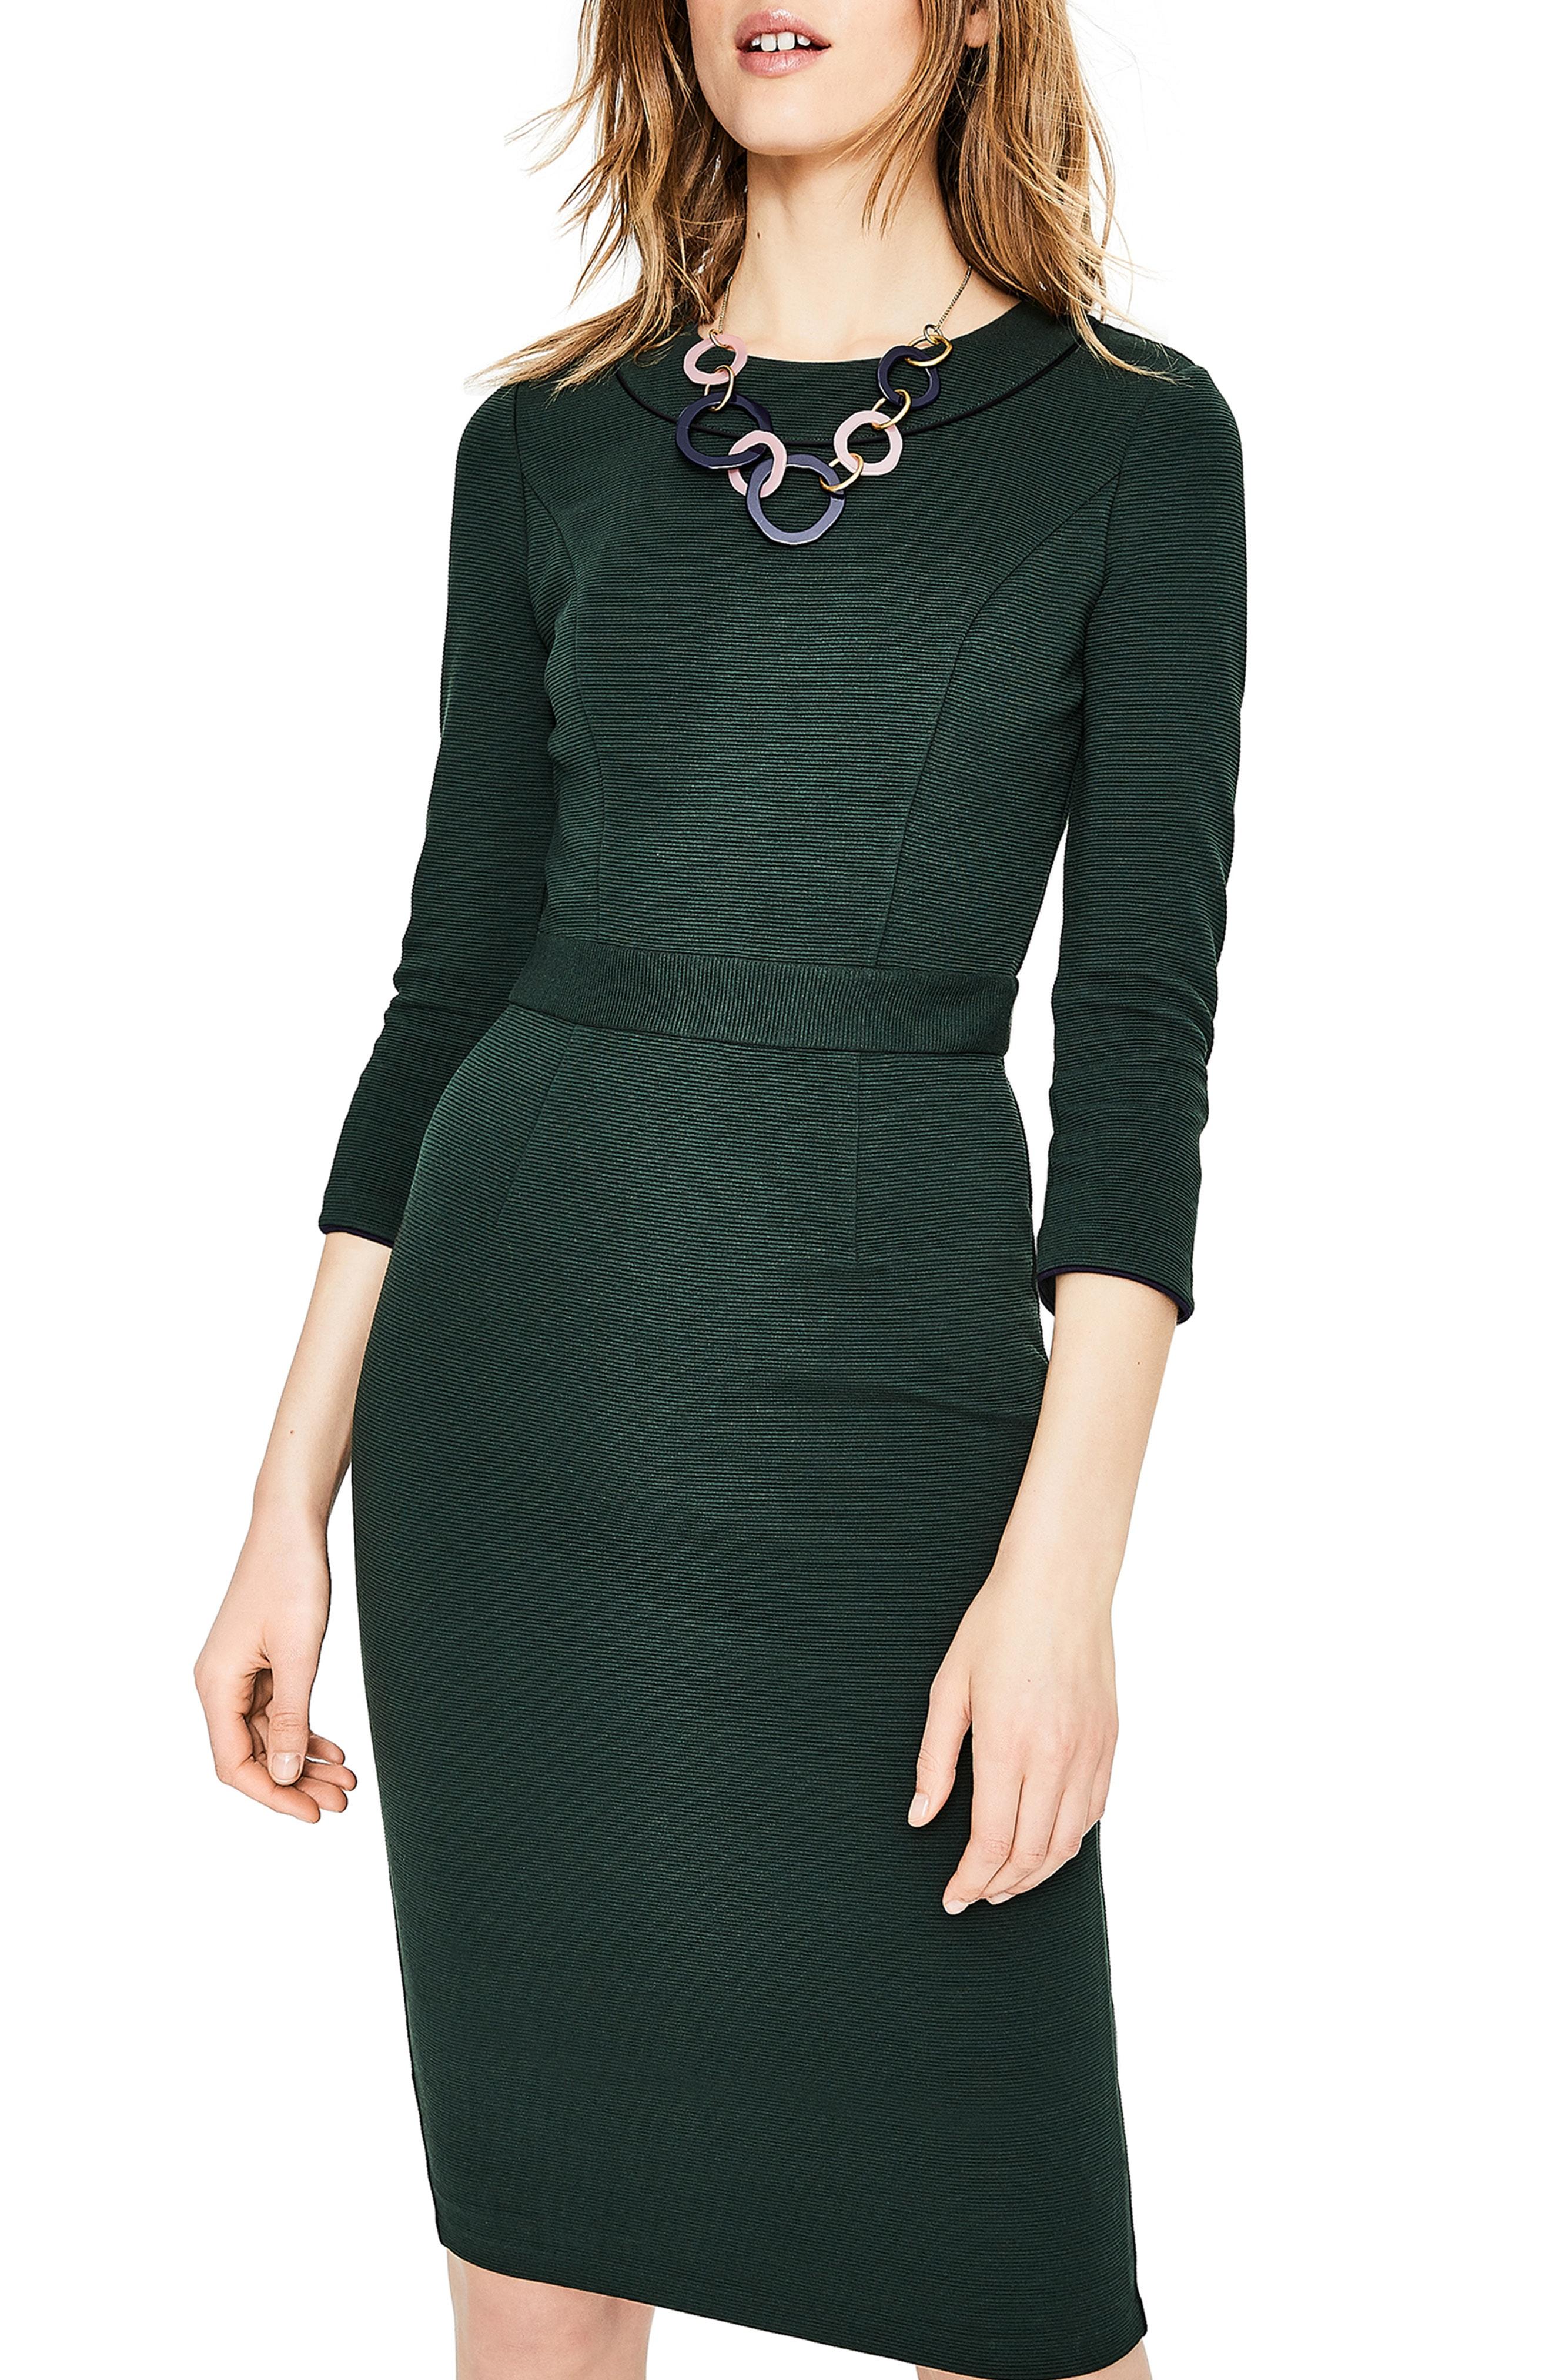 Boden Mia Ottoman Dress